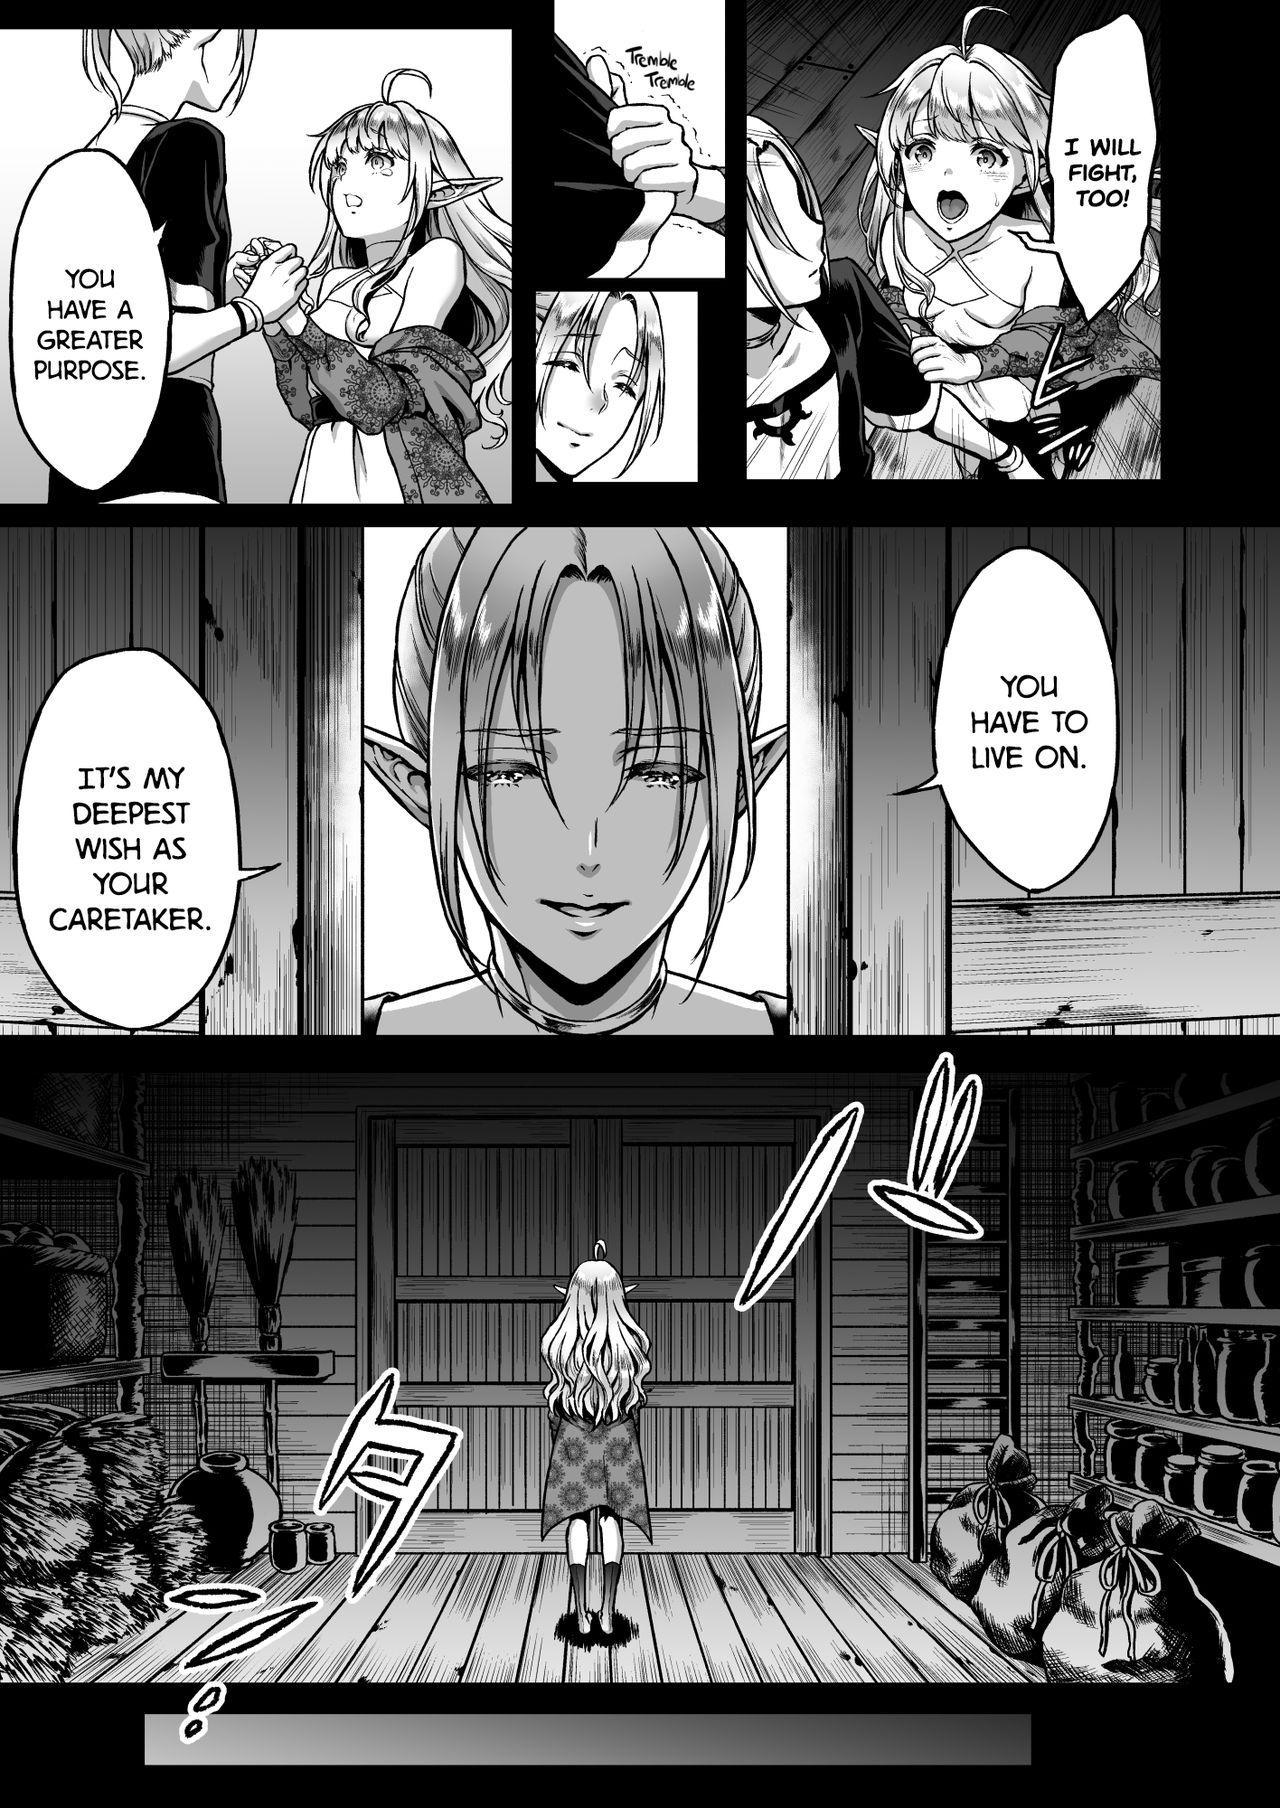 Tasogare no Shou Elf 2 - The story of Emma's side | The Melancholic Elf Whore 2 4